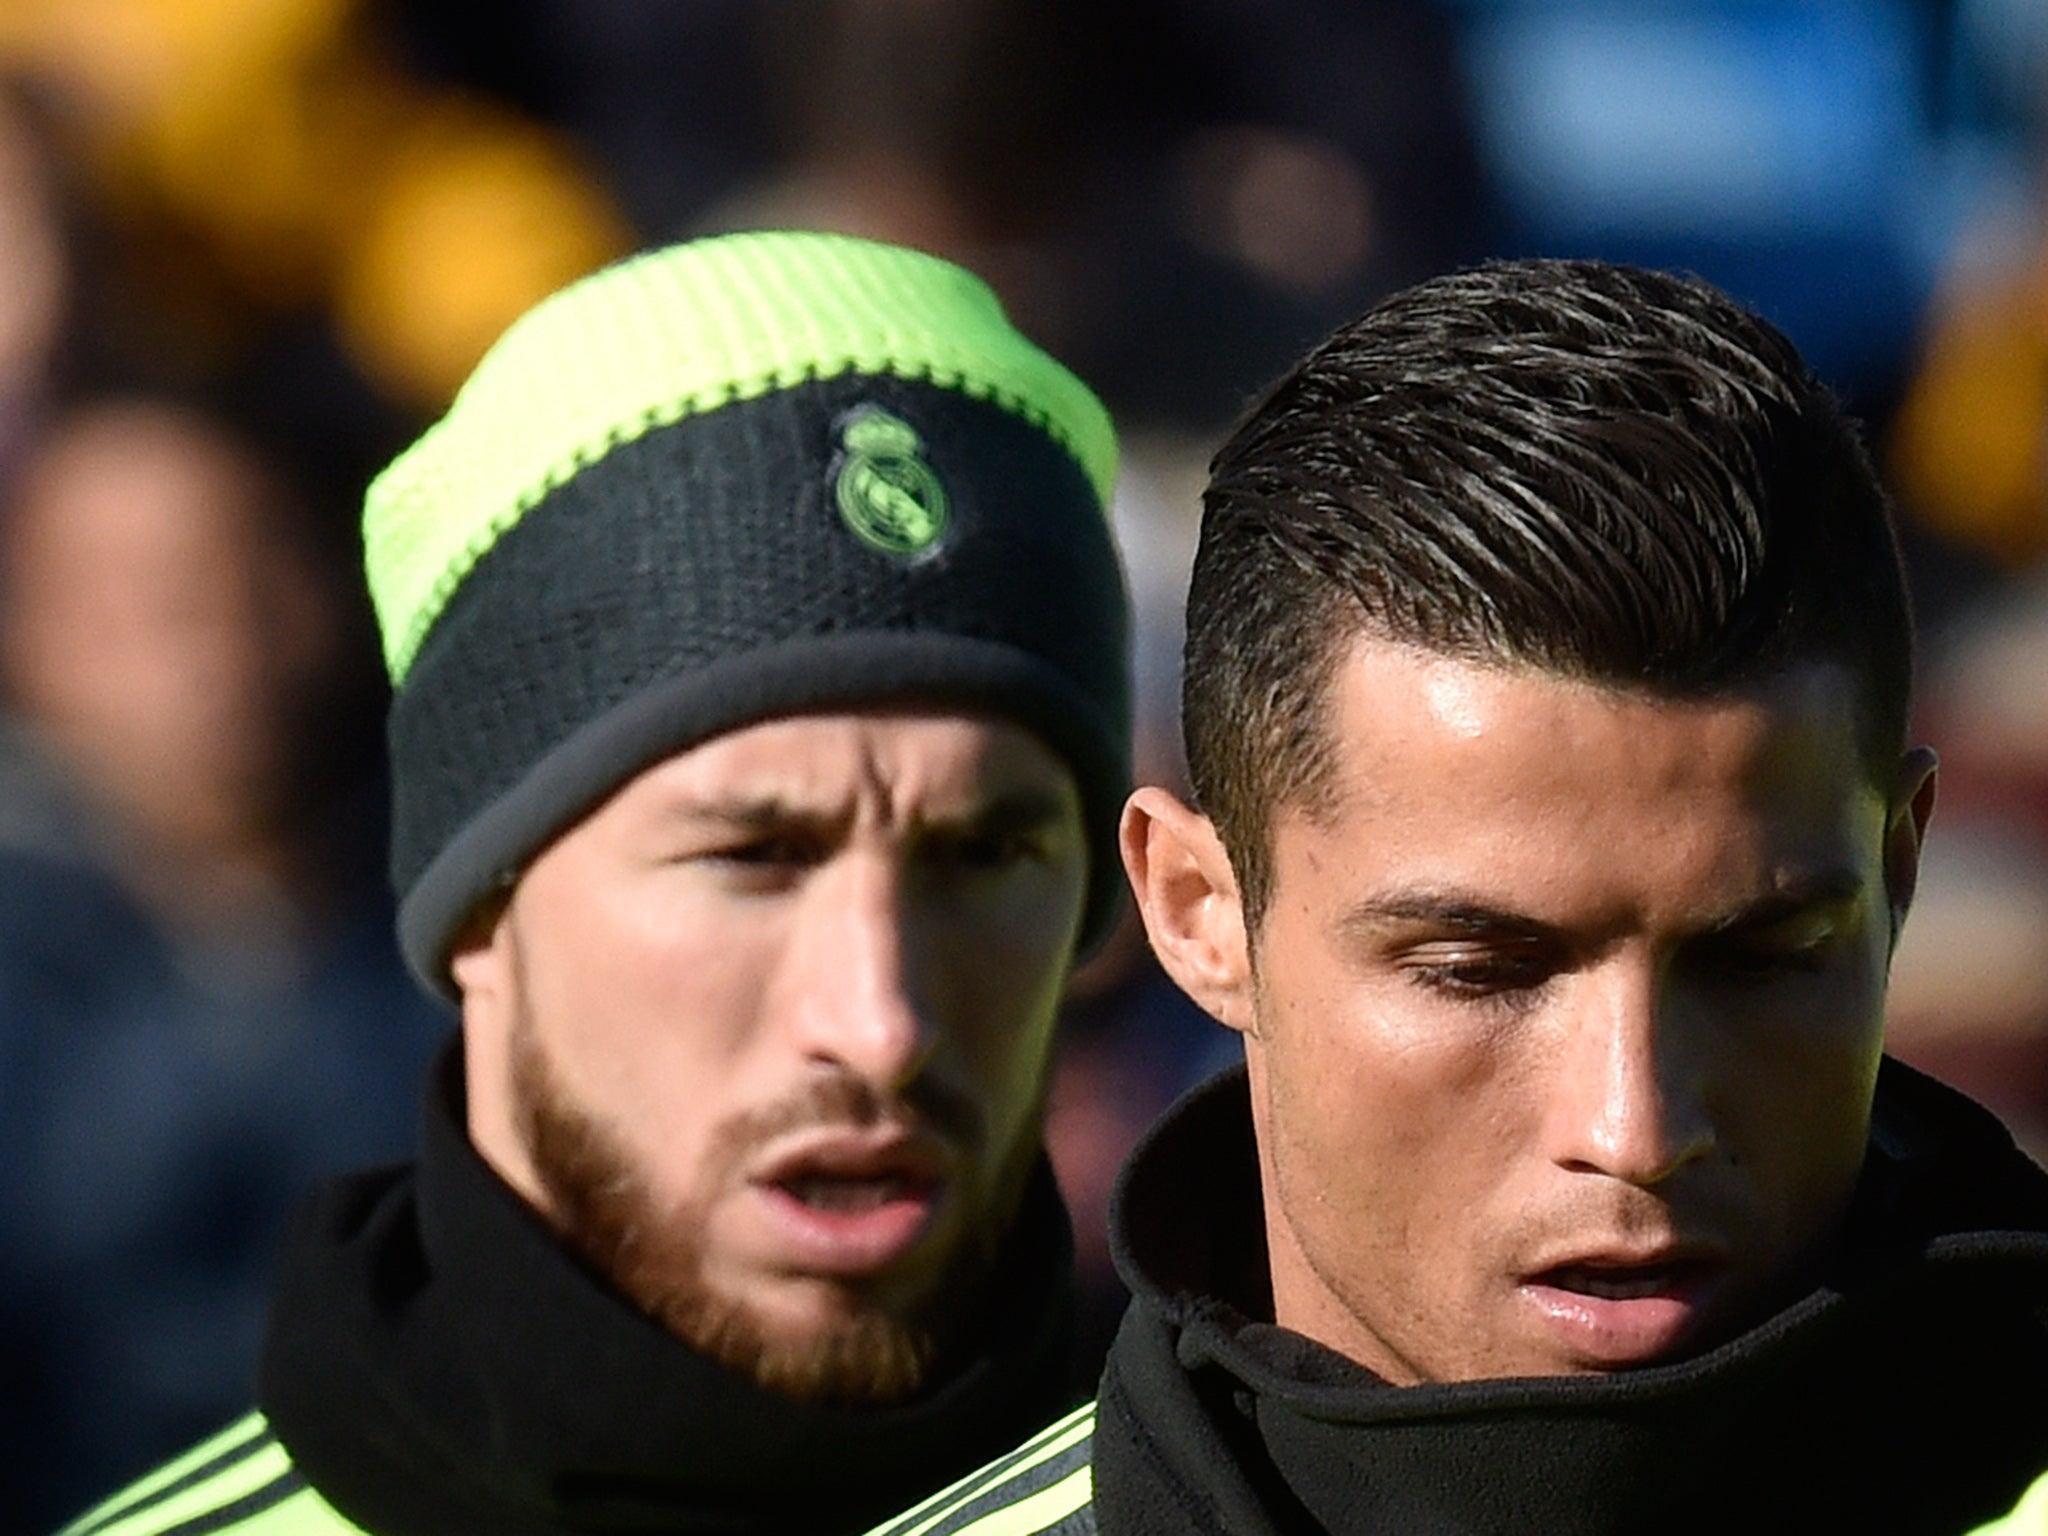 Sergio Ramos and Cristiano Ronaldo Photos Photos - Real ... |Sergio Ramos And Cristiano Ronaldo